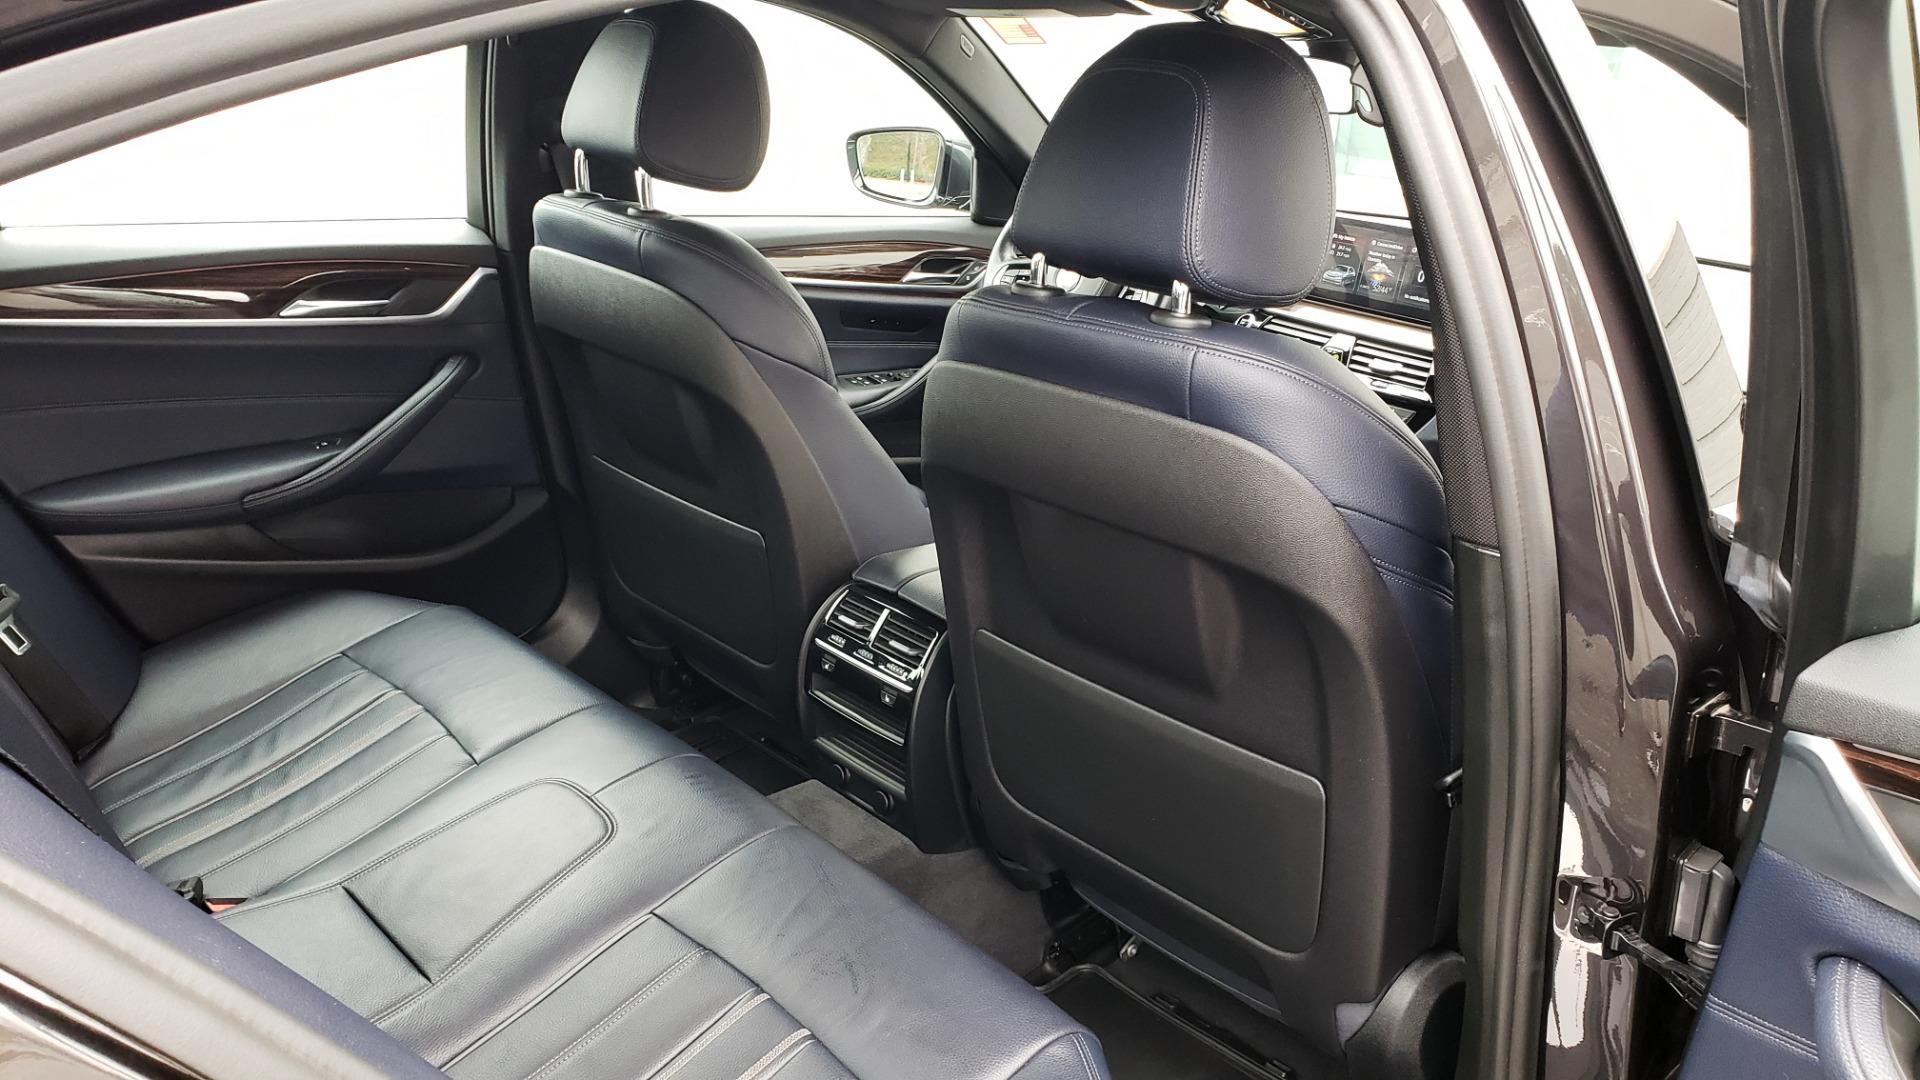 Used 2017 BMW 5 SERIES 530IXDRIVE / PREM PKG / DRVR ASST PLUS / CLD WTHR / APPLE CARPLAY for sale Sold at Formula Imports in Charlotte NC 28227 75